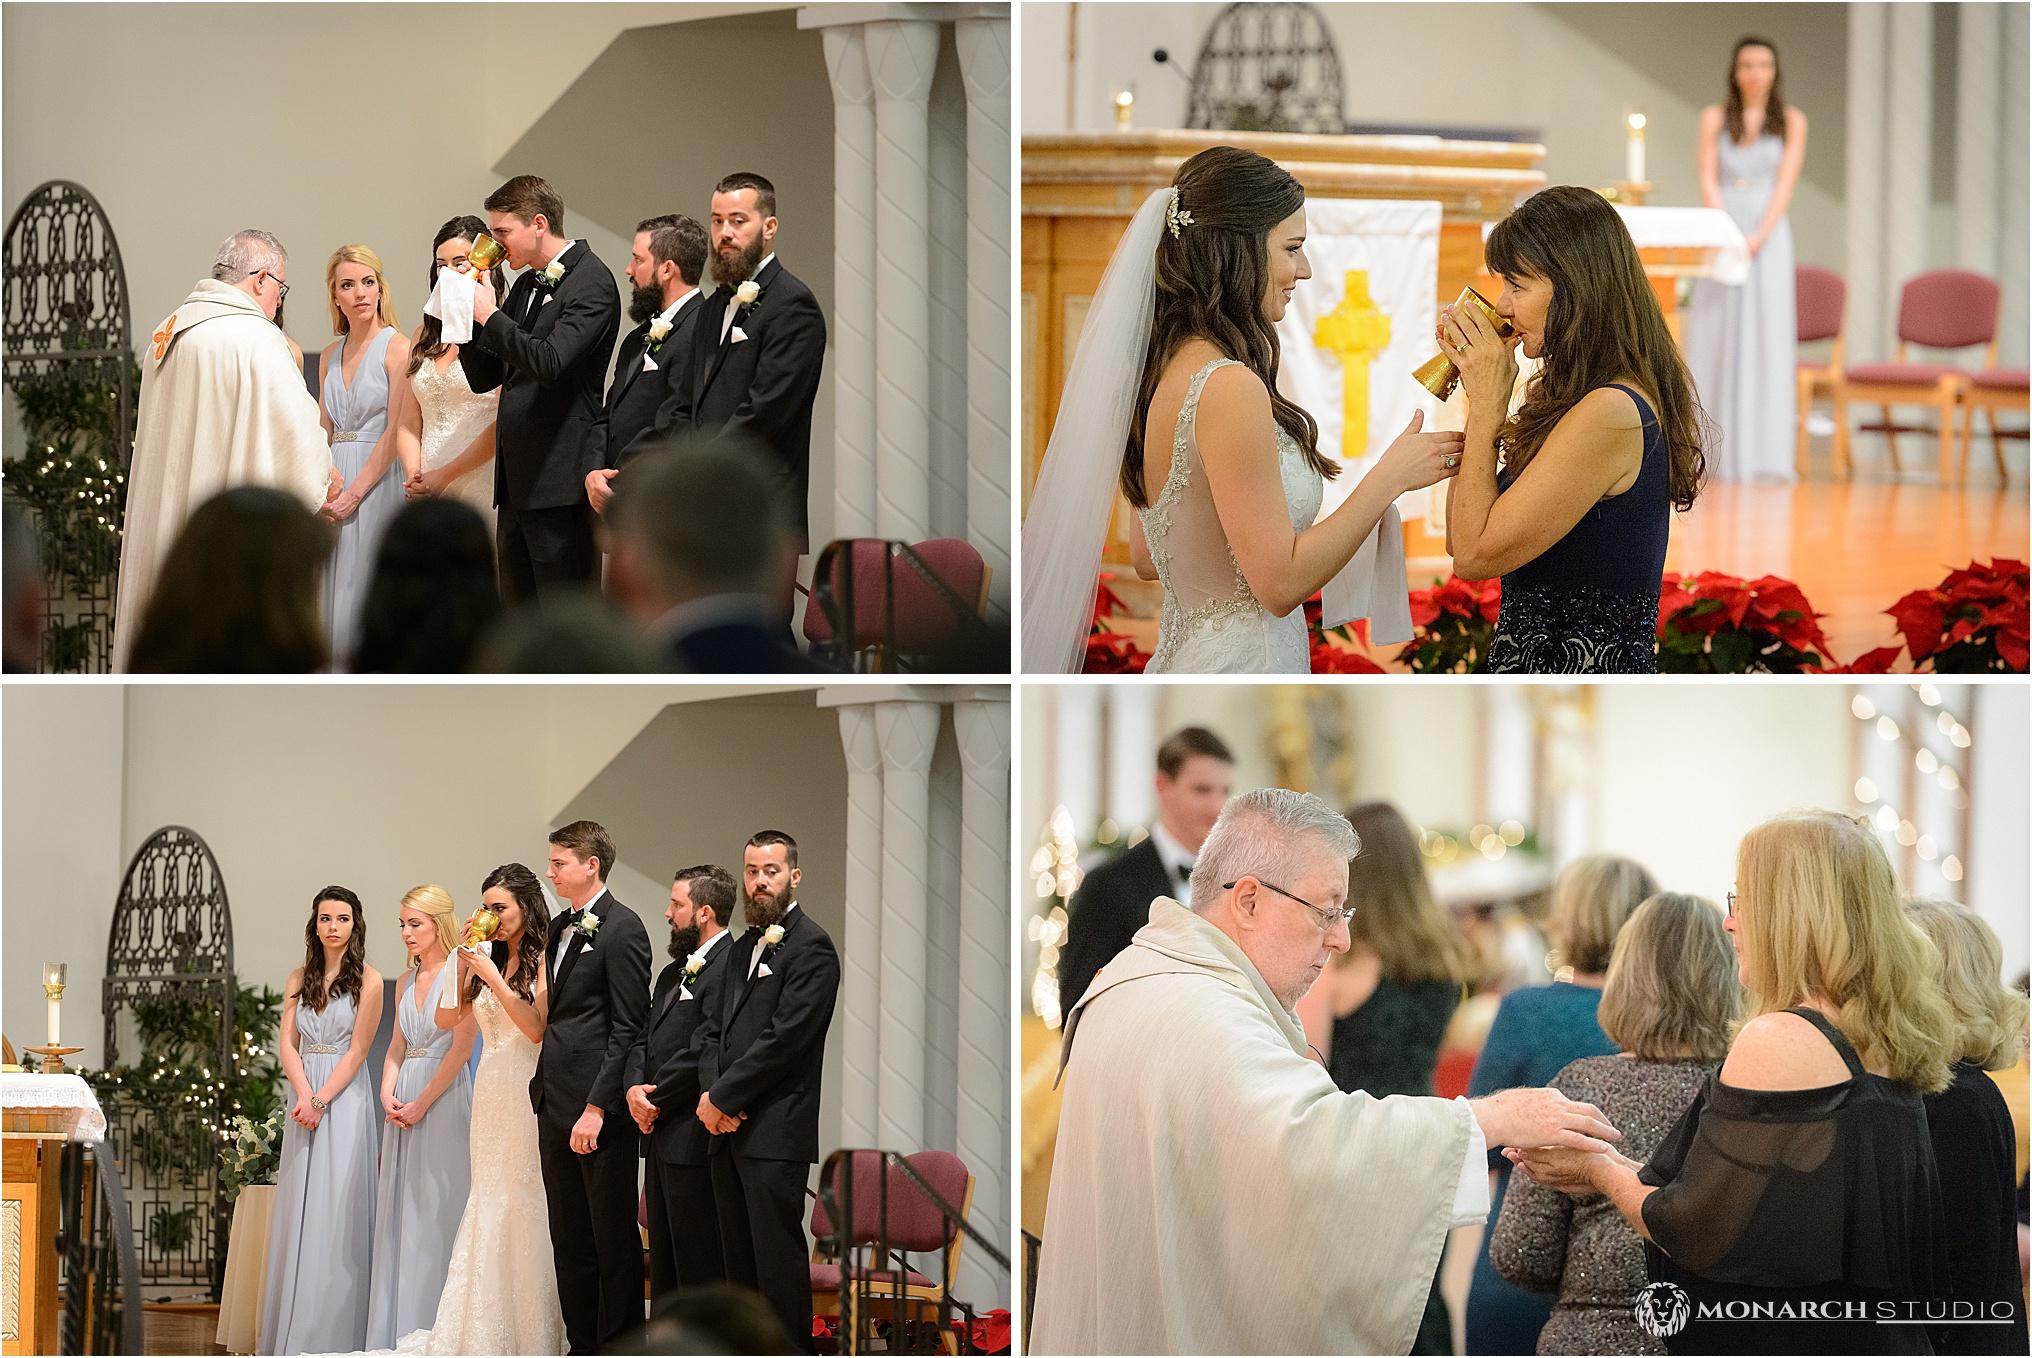 saint-augustine-wedding-photographer-treasury-047.jpg